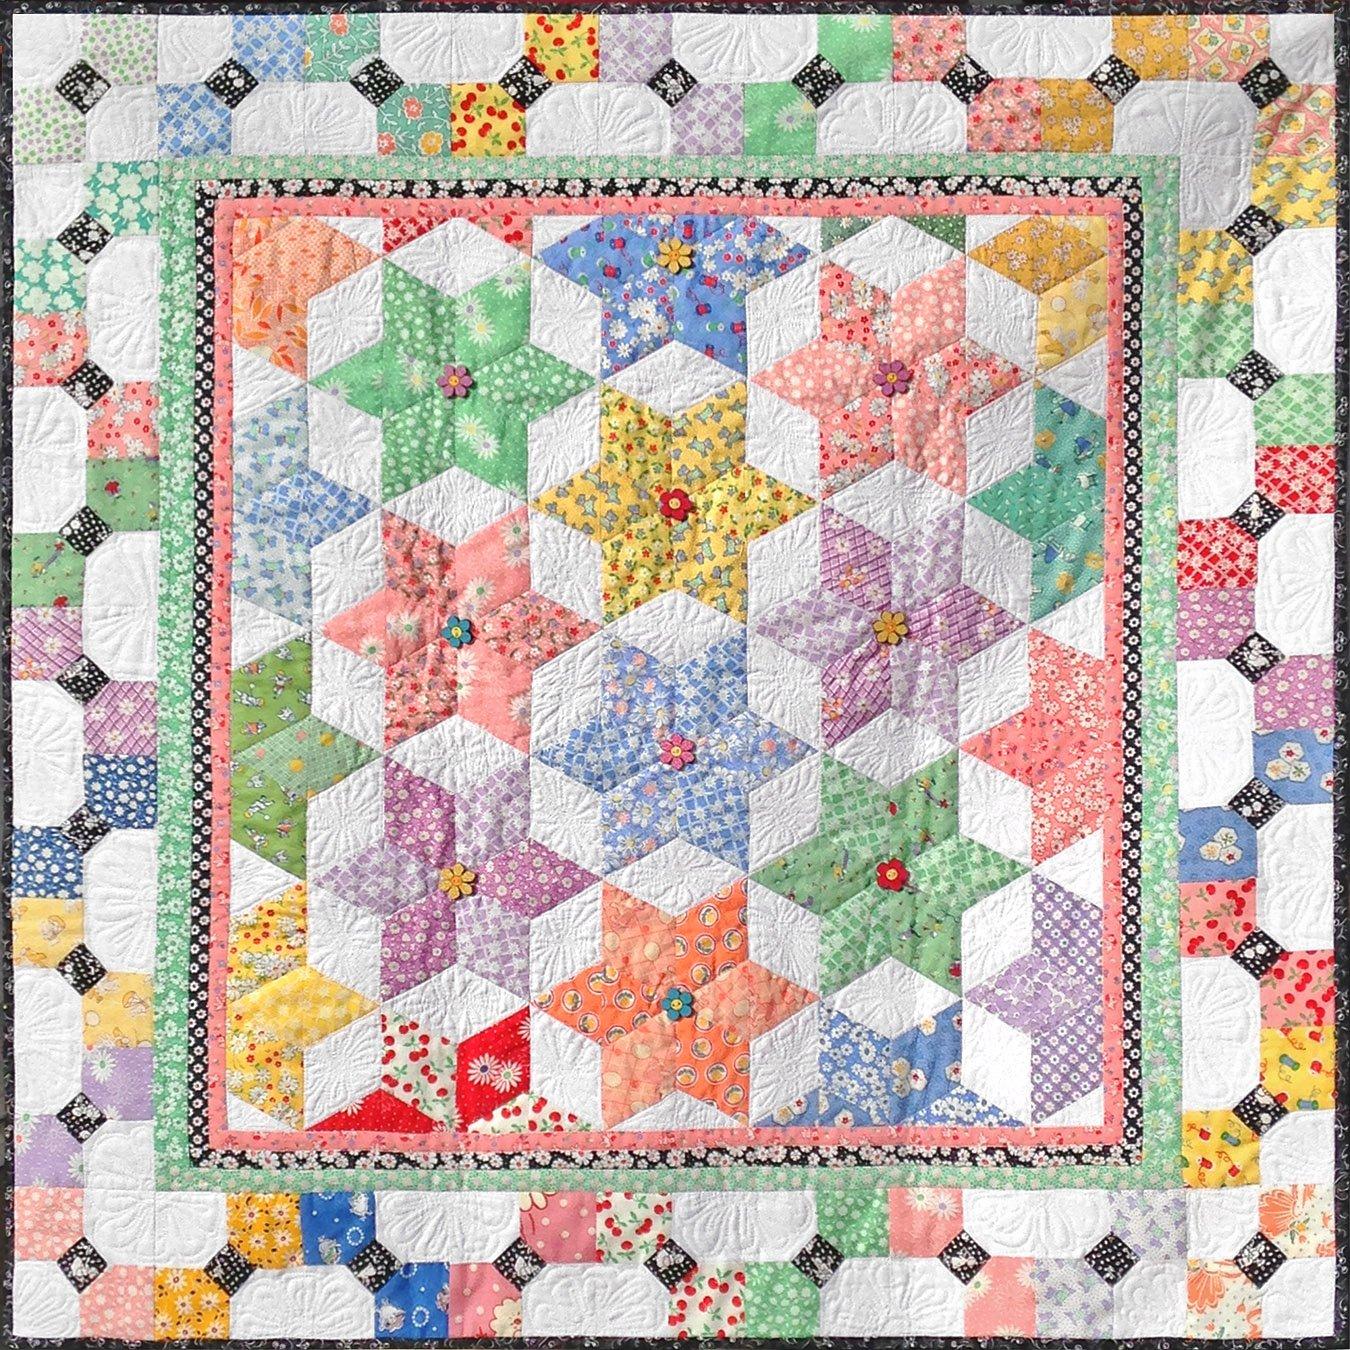 Diamond Star Fabric Kit 30 S Reproductions